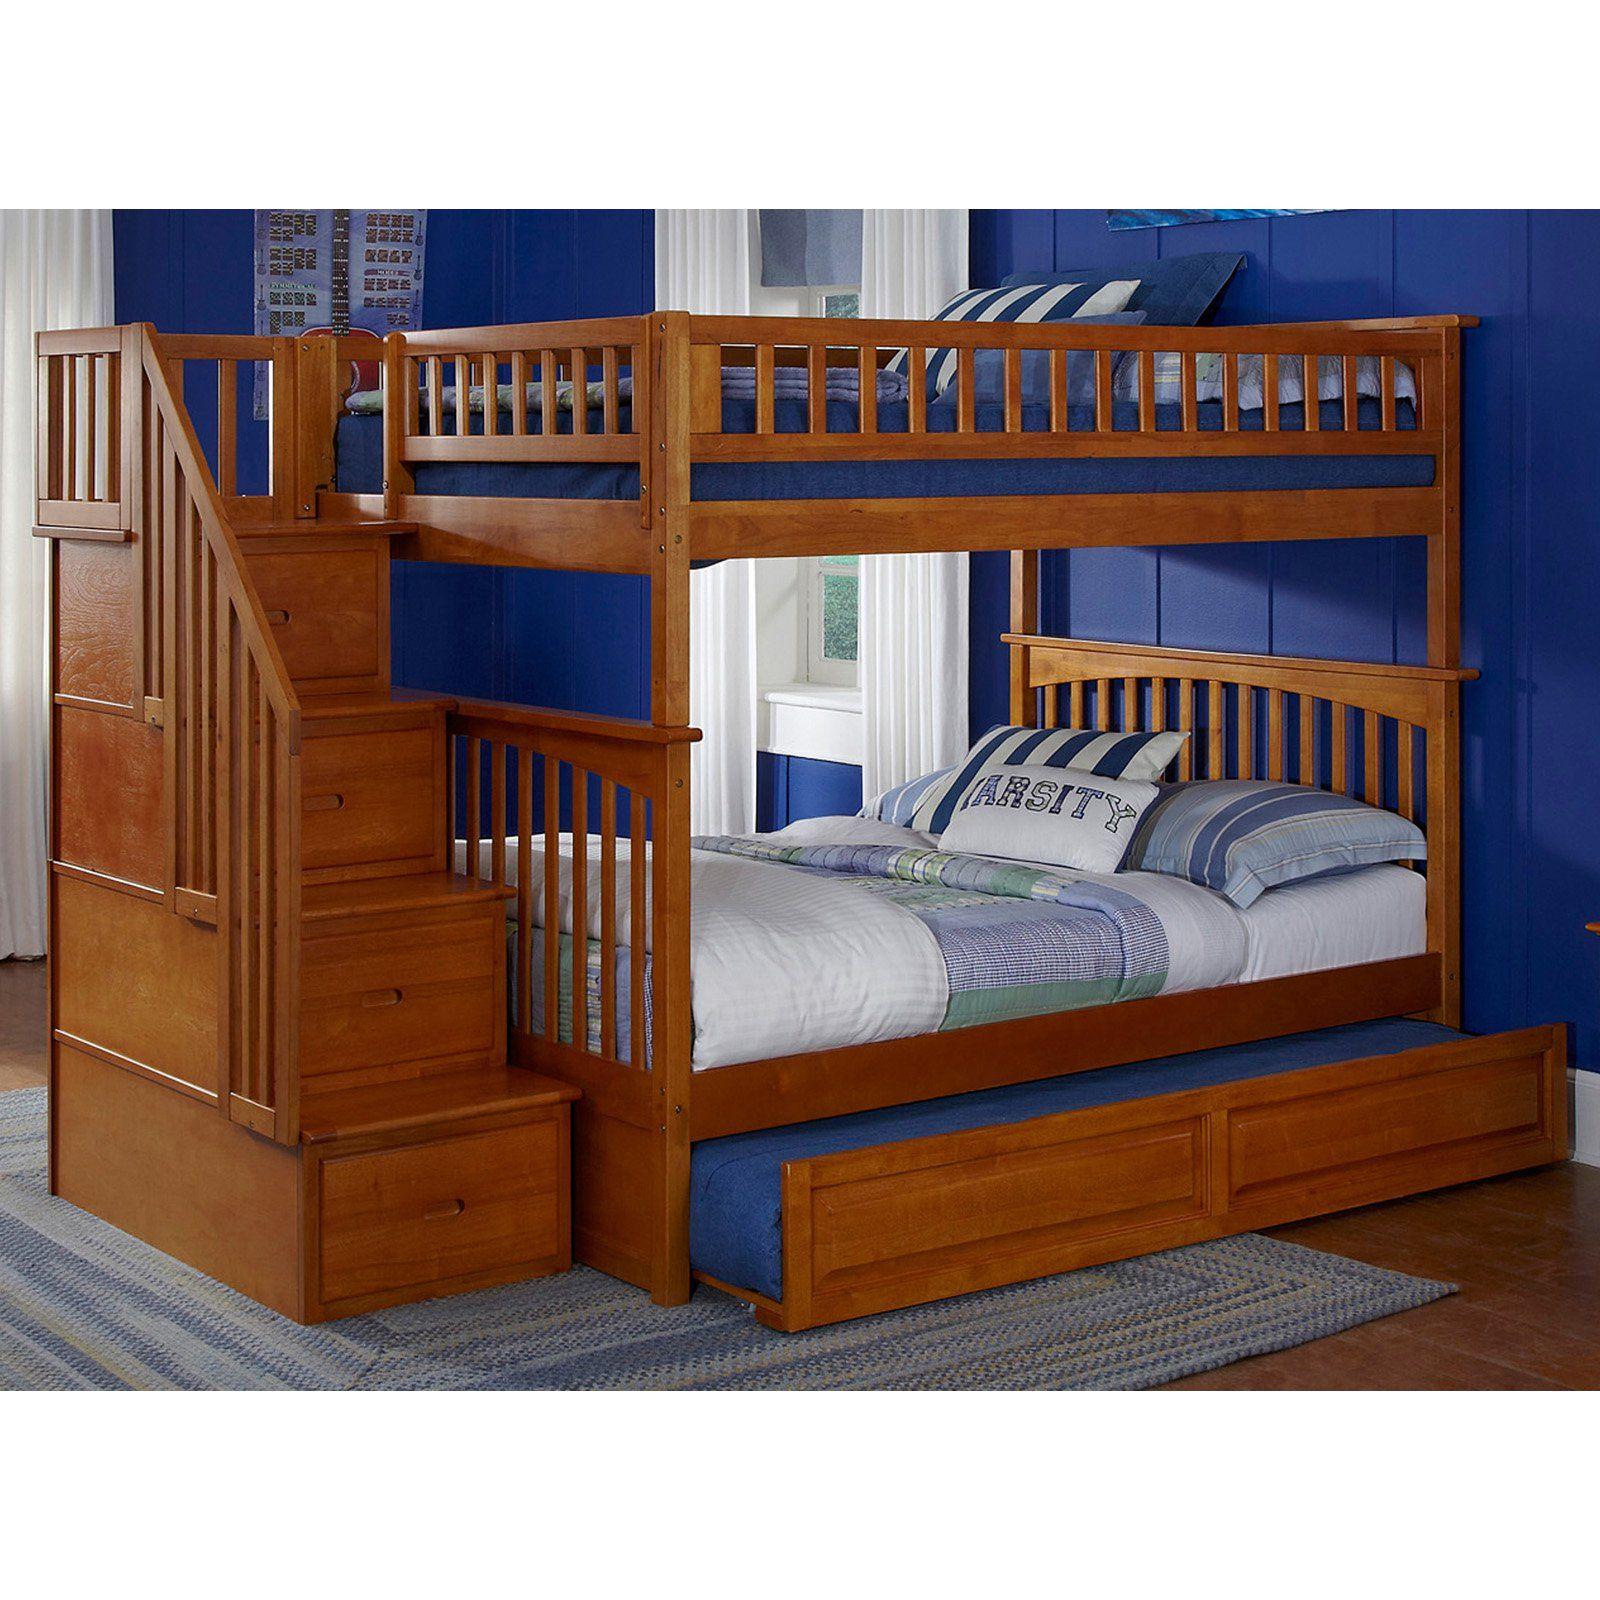 Best Atlantic Furniture Columbia Staircase Full Over Full Bunk 400 x 300